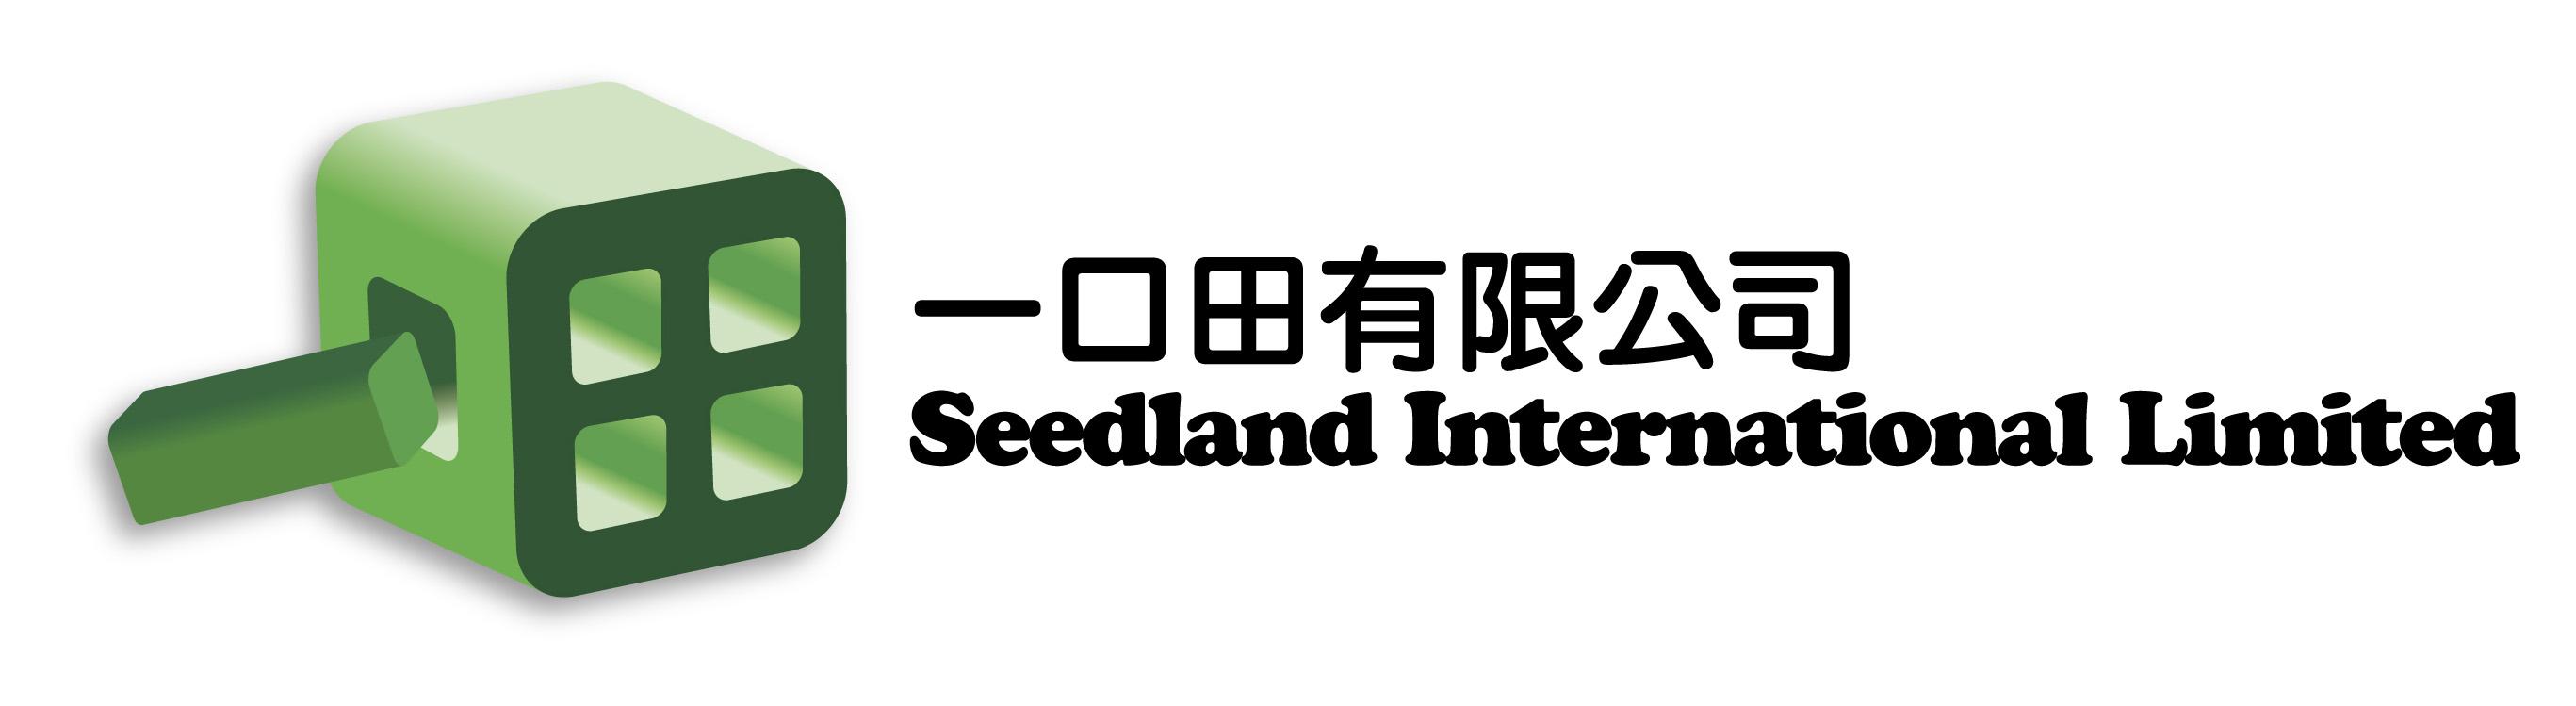 seedland2